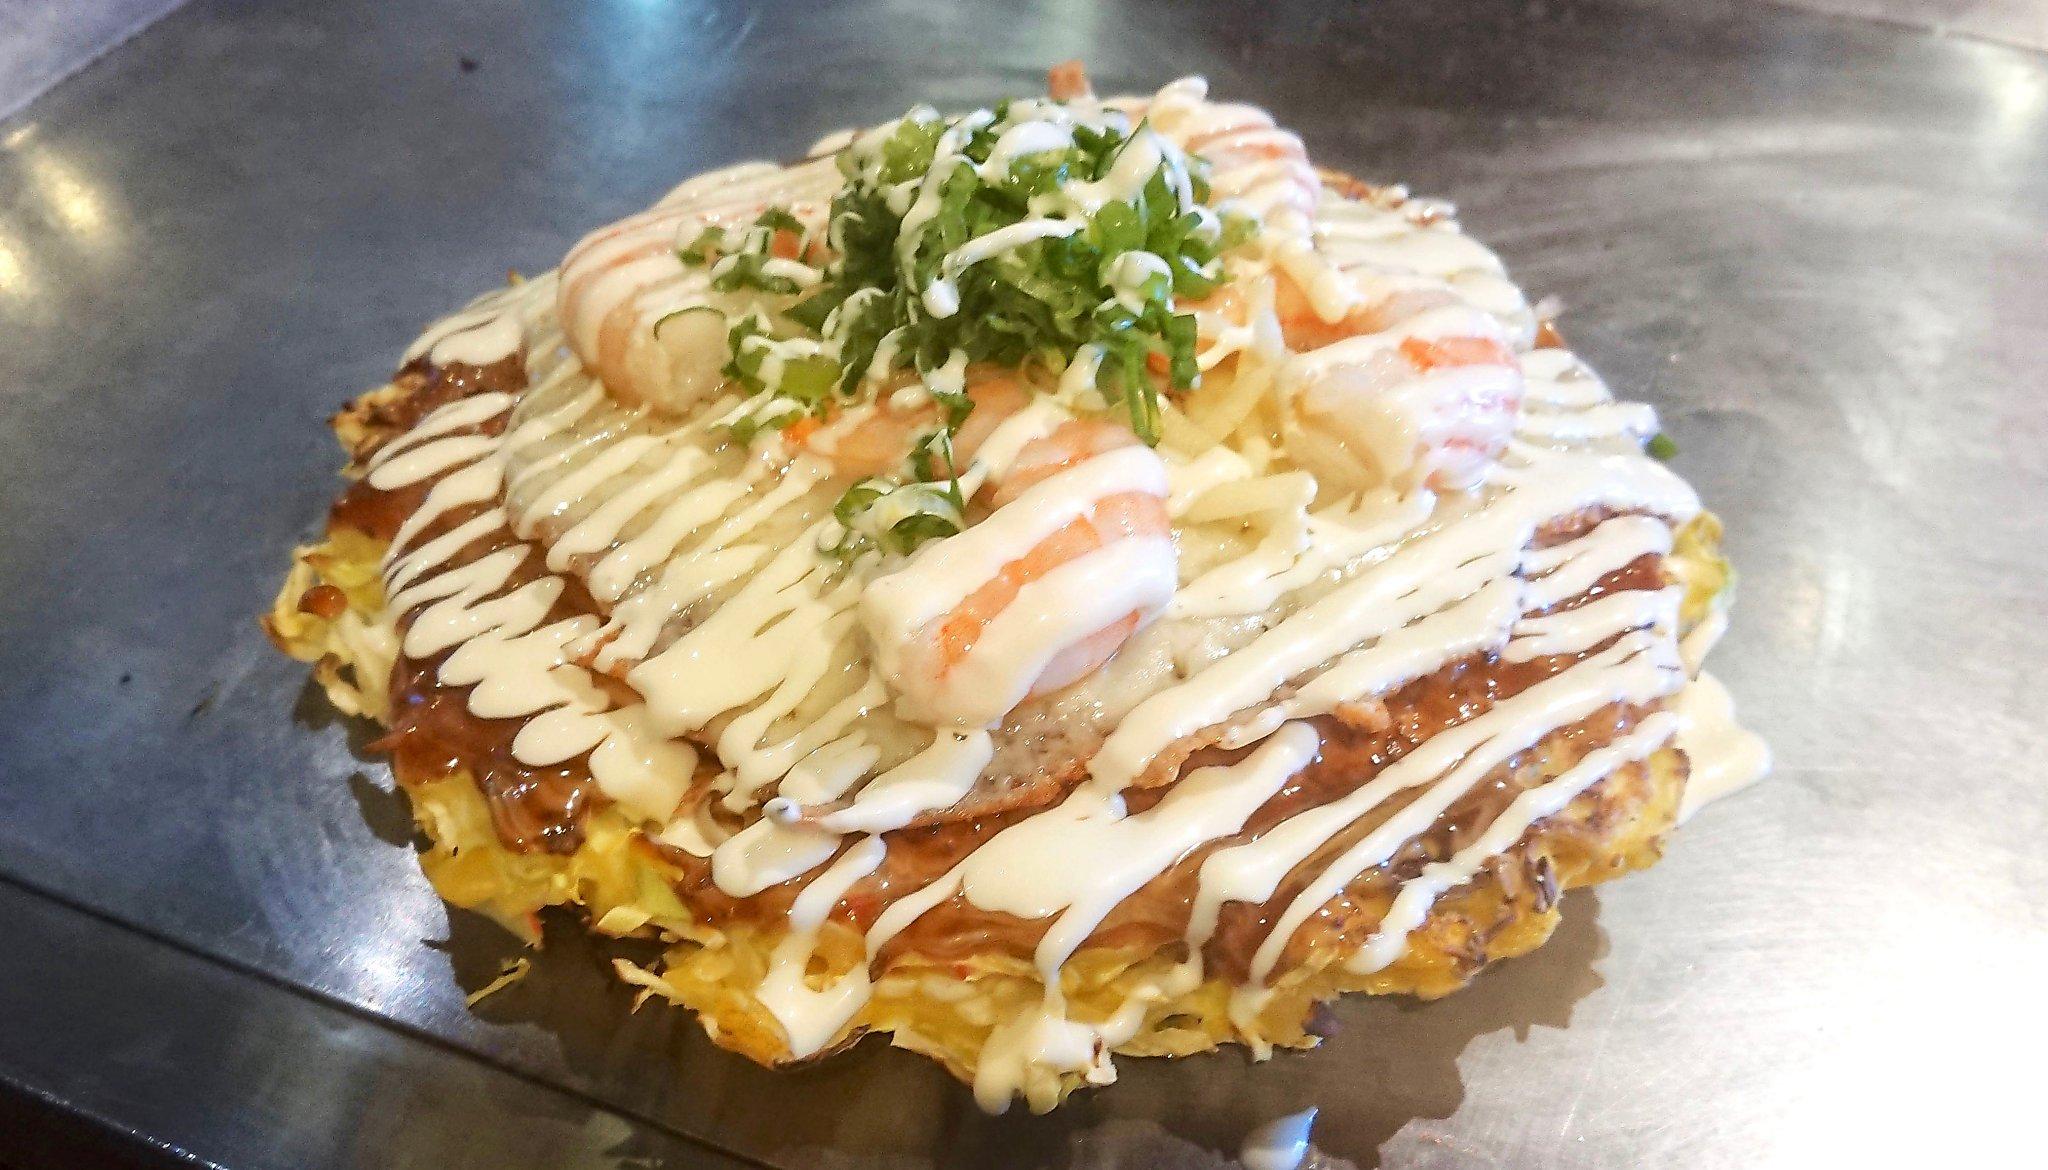 Japanese chain Fugetsu brings its crispy, saucy okonomiyaki to Sunnyvale